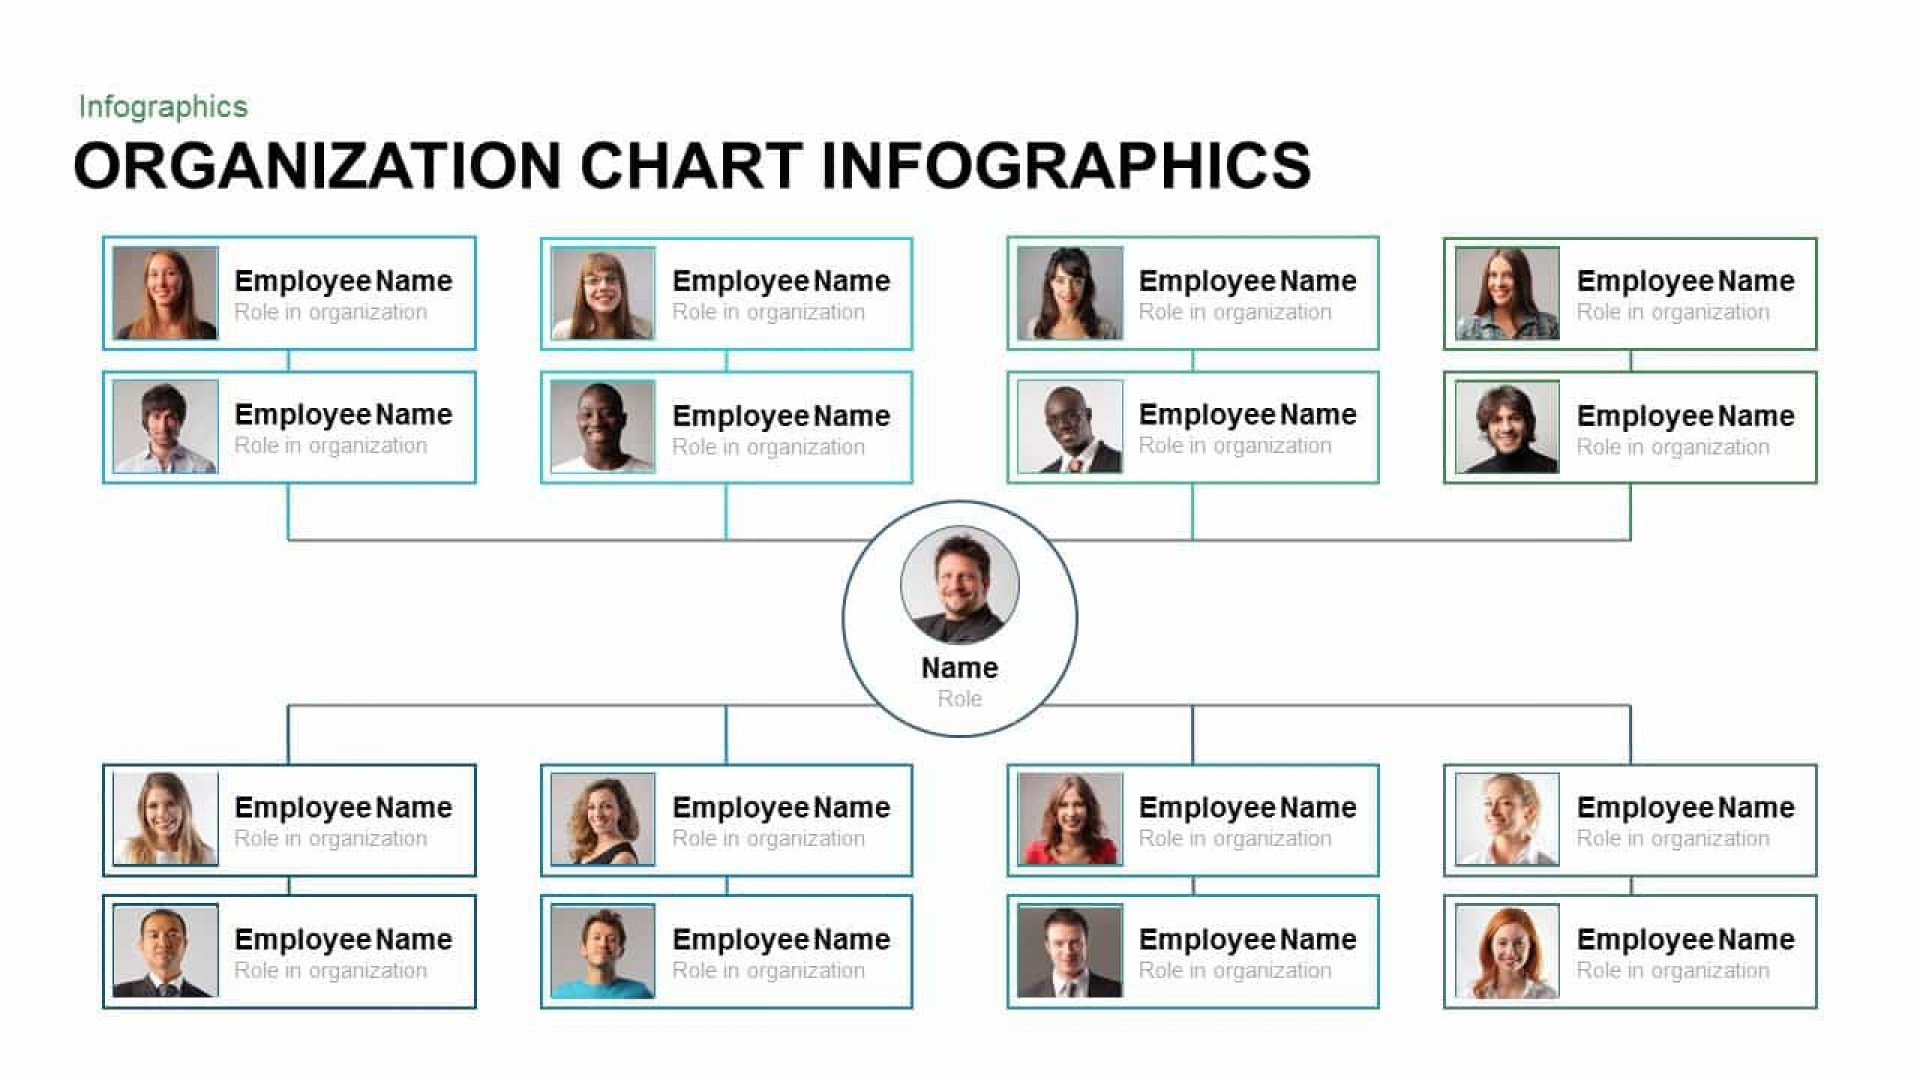 007 Top Org Chart Template Powerpoint Inspiration  Free Organization Download Organizational 20101920